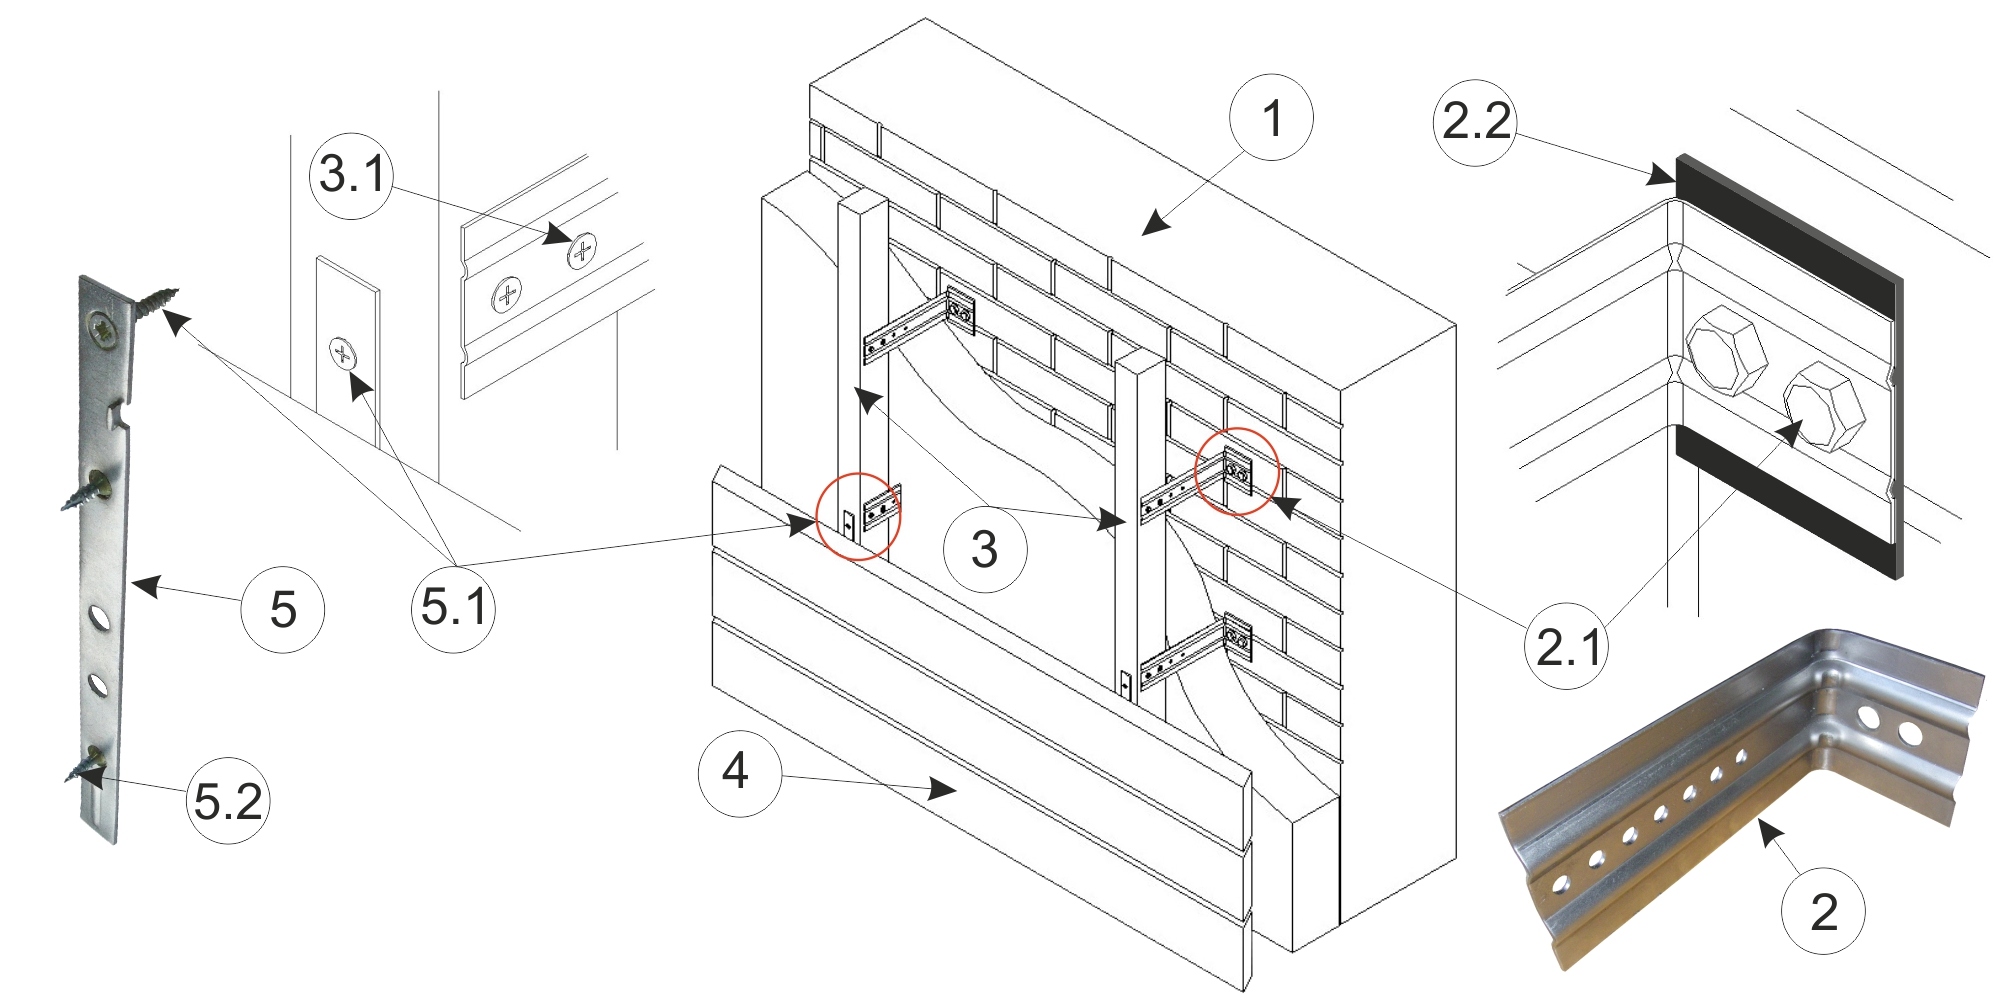 Фото: Схема установки простого каркаса под вентфасад